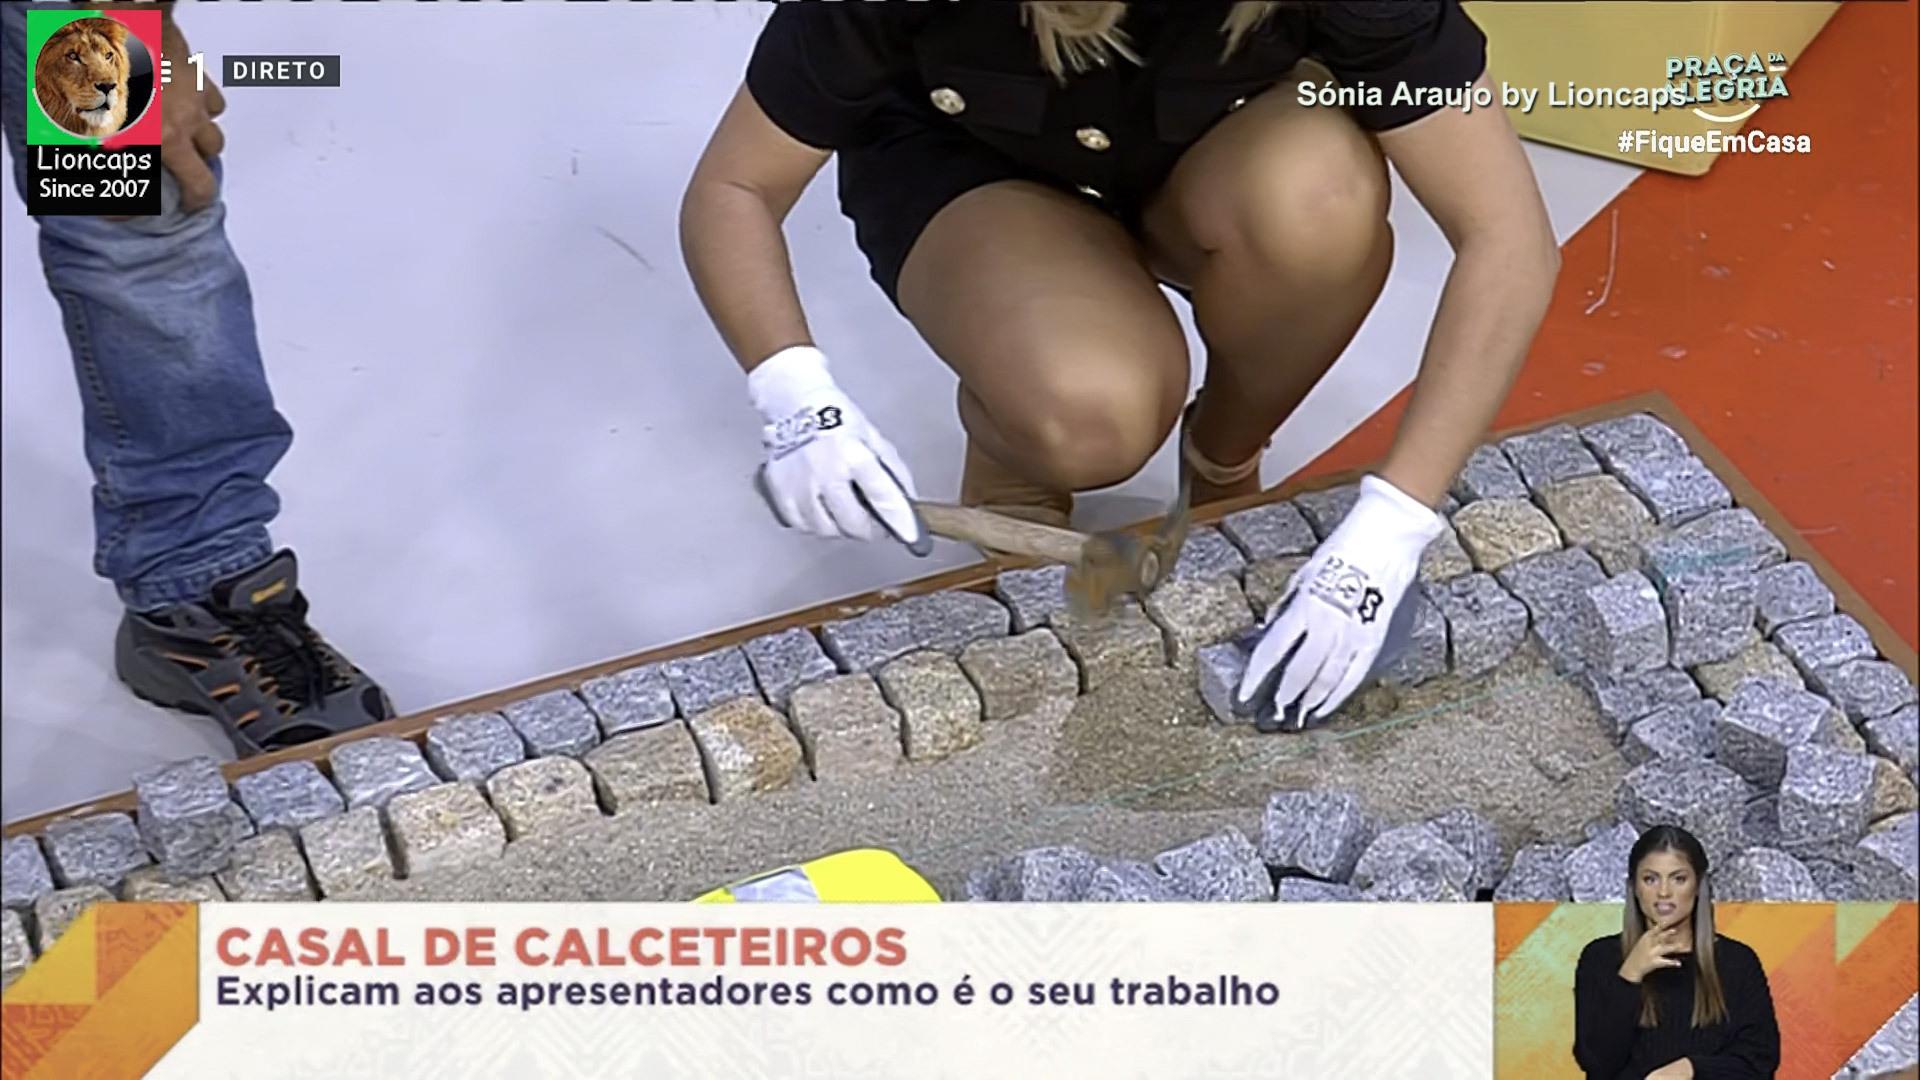 sonia_araujo_praca_lioncaps_11_04_2021 (7).jpg